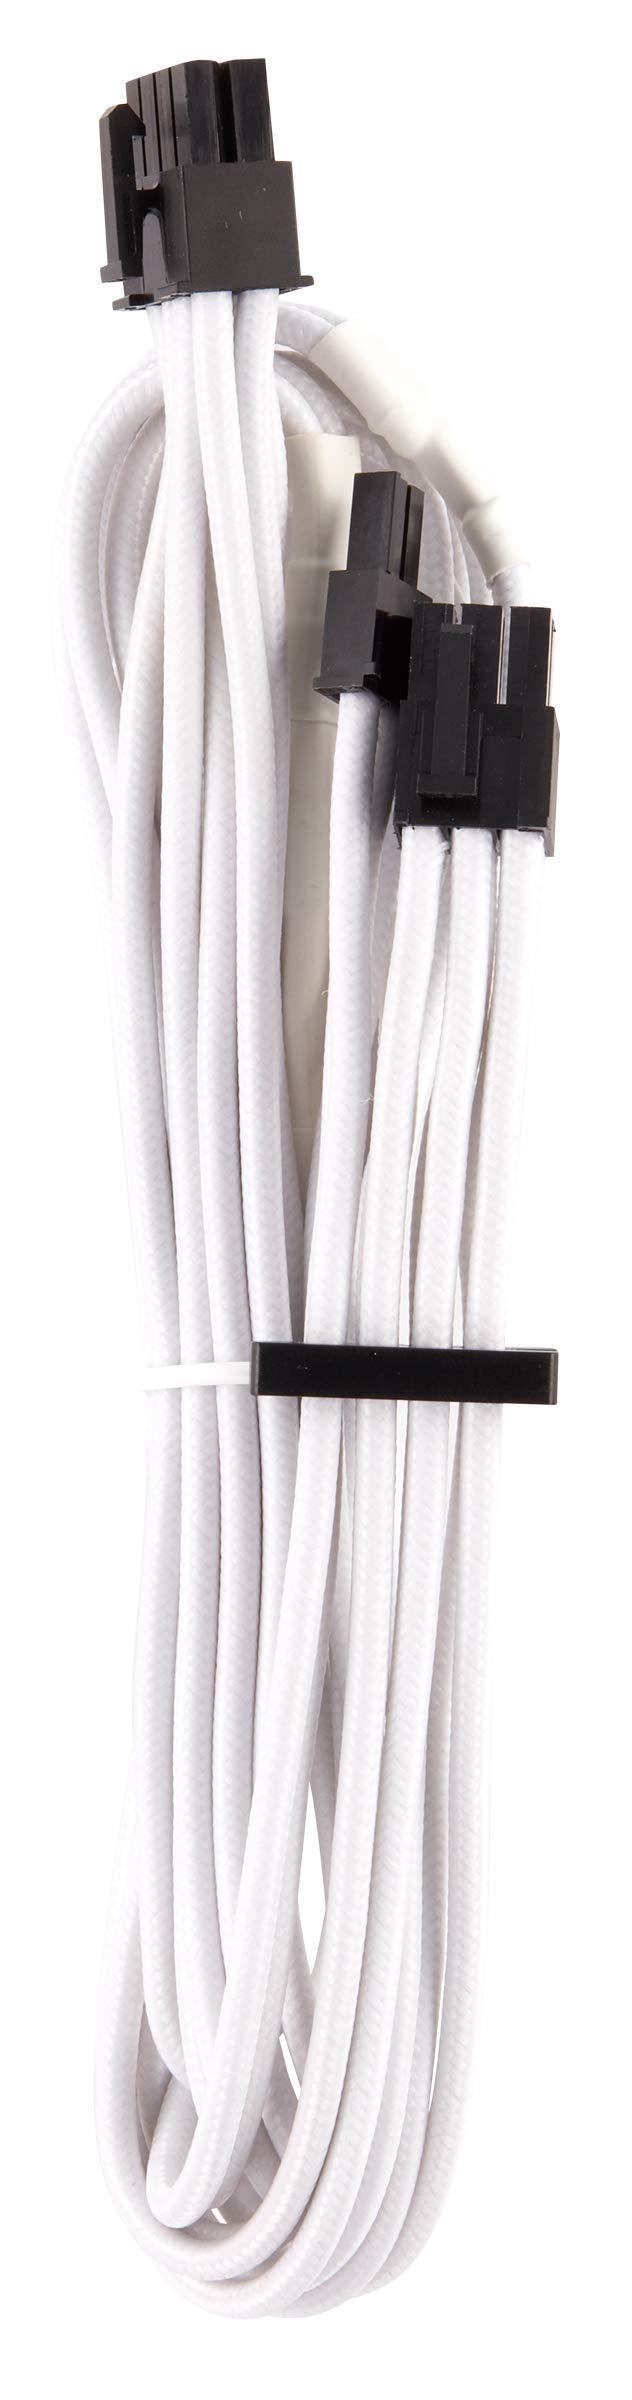 CORSAIR Premium Individually Sleeved PSU Cables Starter Kit - Black, 2 Yr Warranty, for Corsair PSUs by Corsair (Image #7)